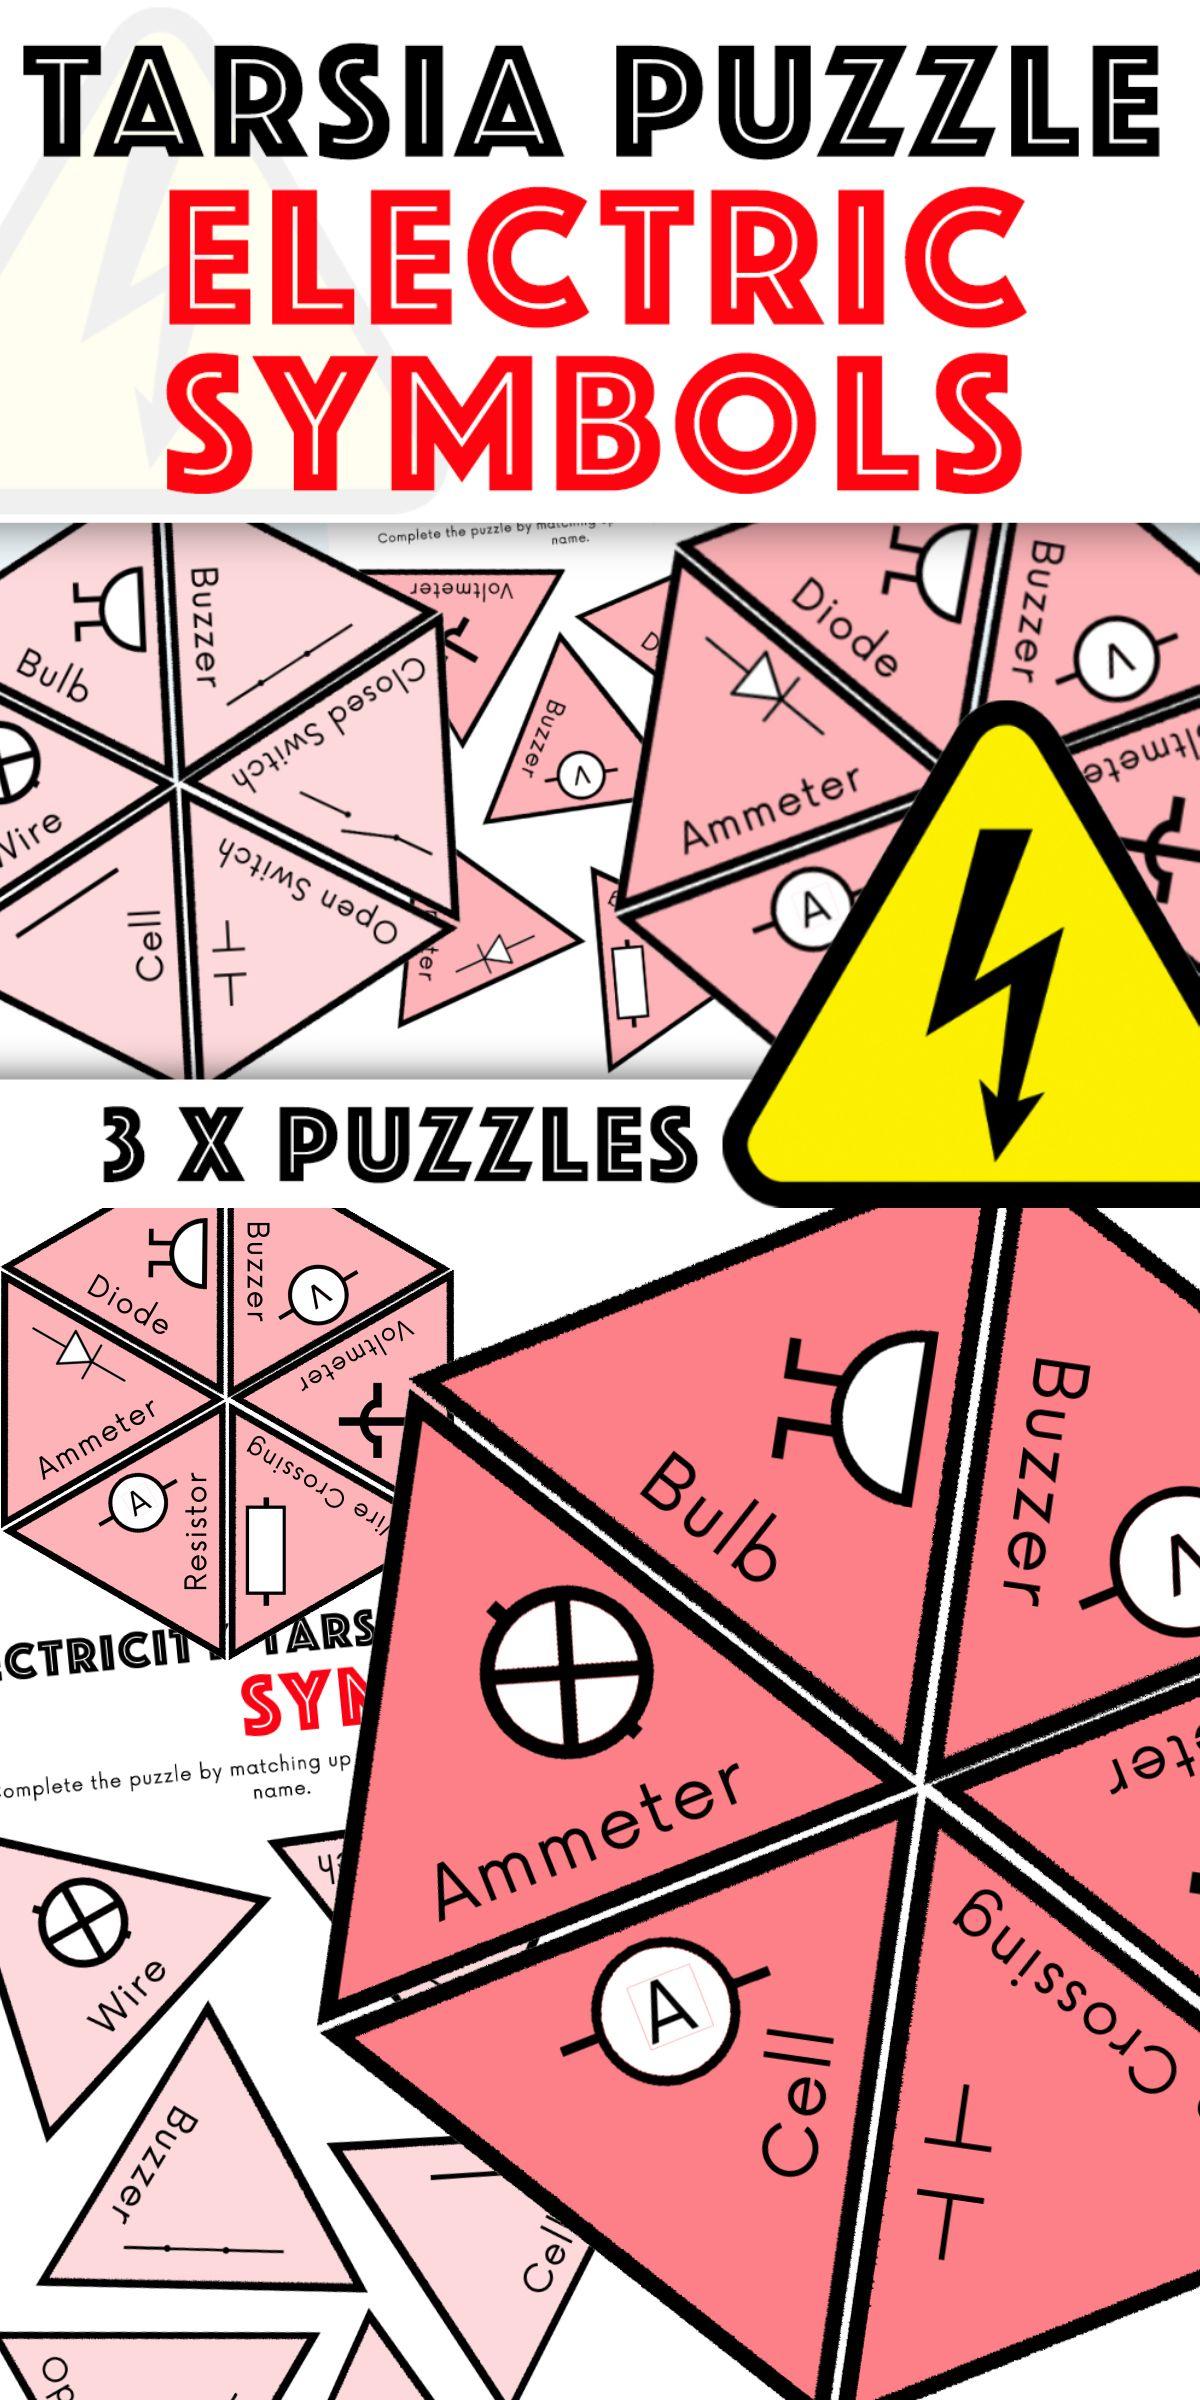 Electricity Tarsia Puzzle Electric Symbols